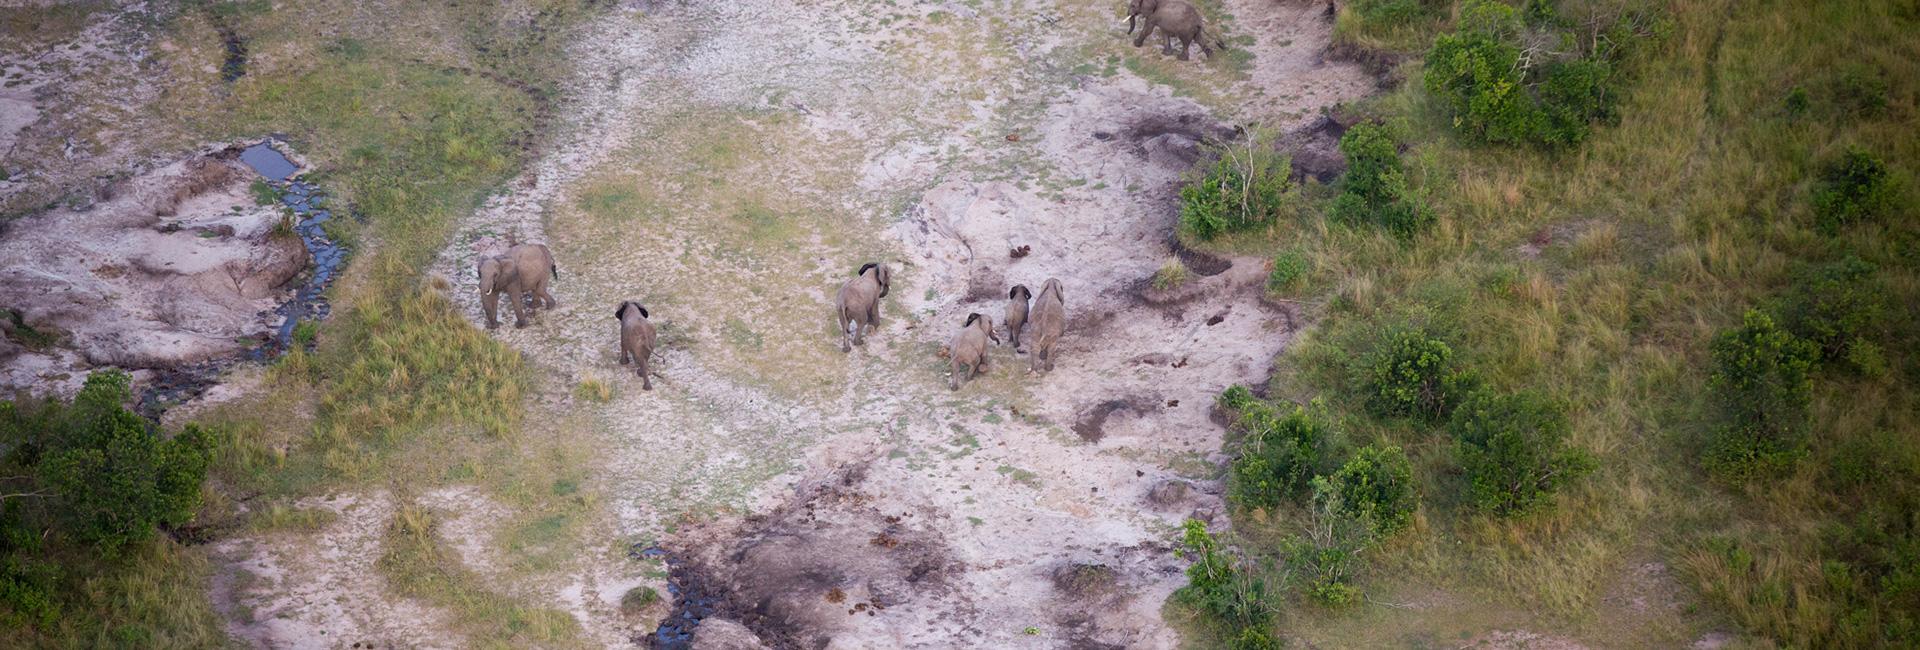 Elephants from Above Balloon Safari Iconic Africa